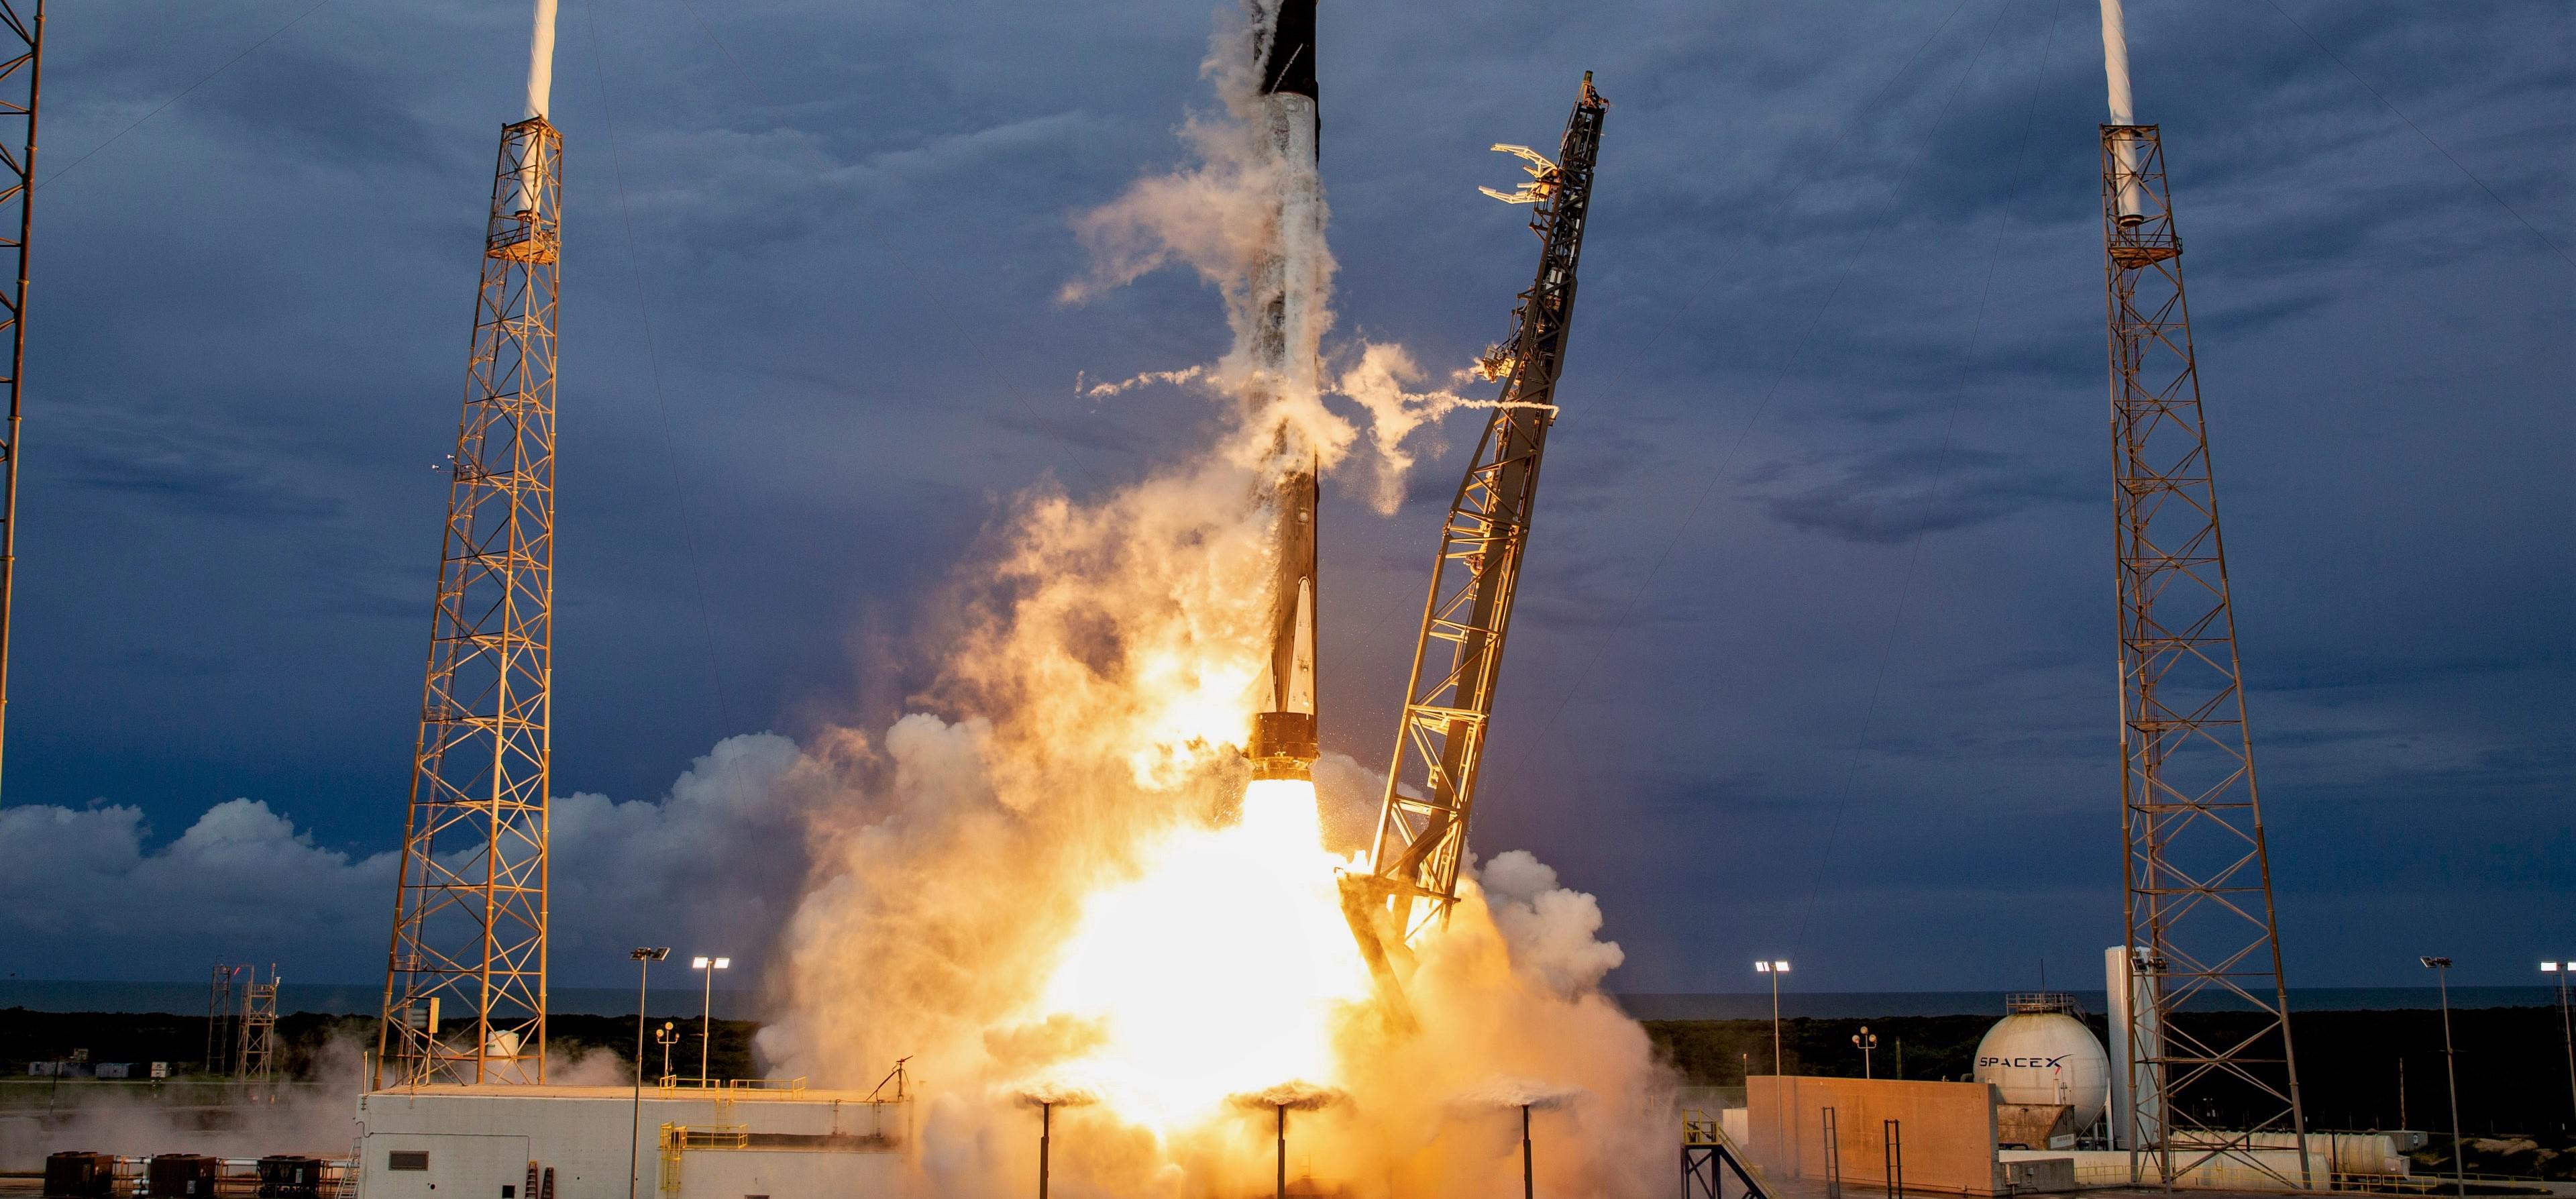 AMOS-17 Falcon 9 B1047 LC-40 liftoff 080619 (SpaceX) 7 crop